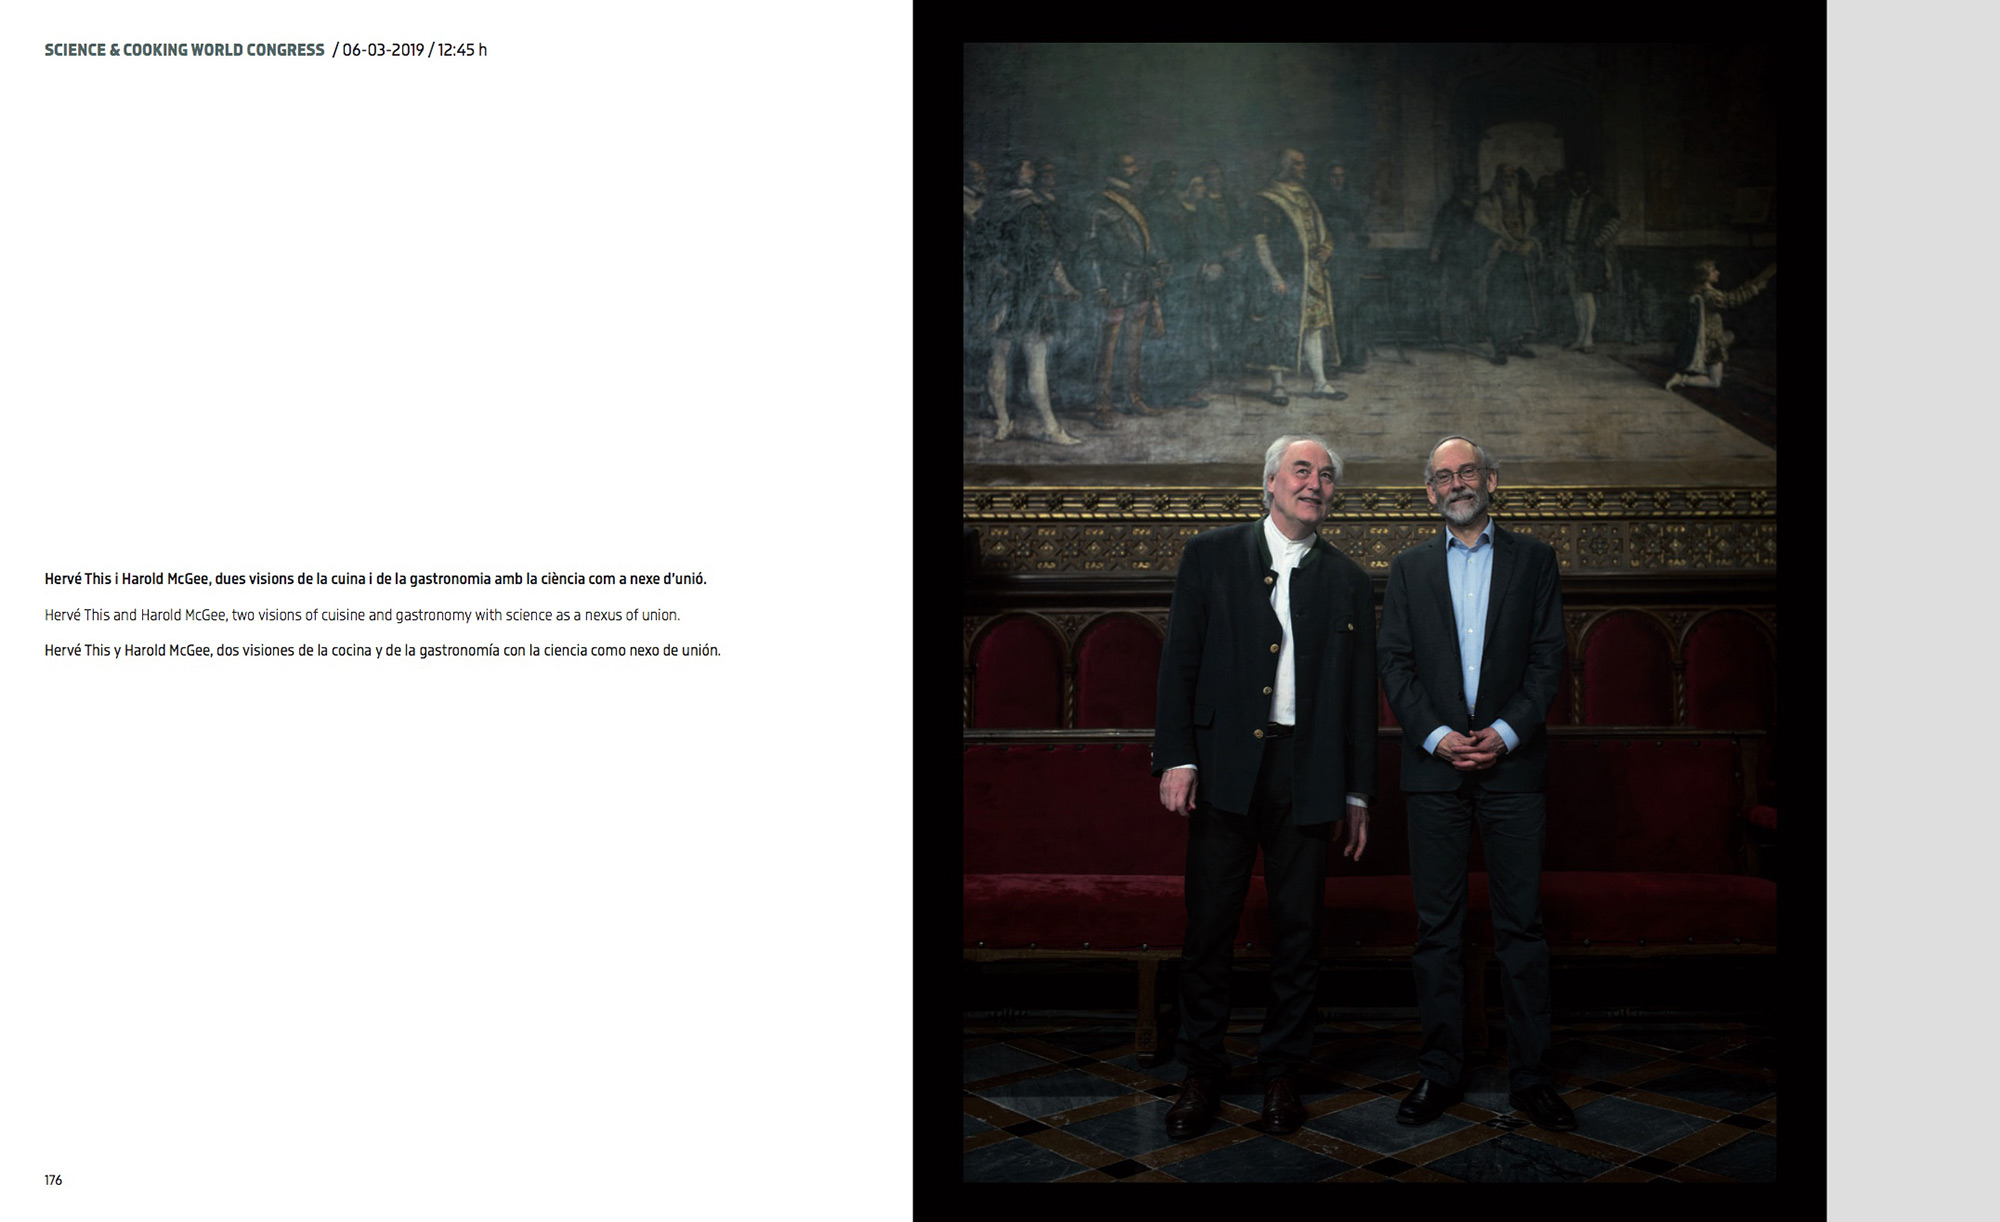 Hervé This & Harold McGee